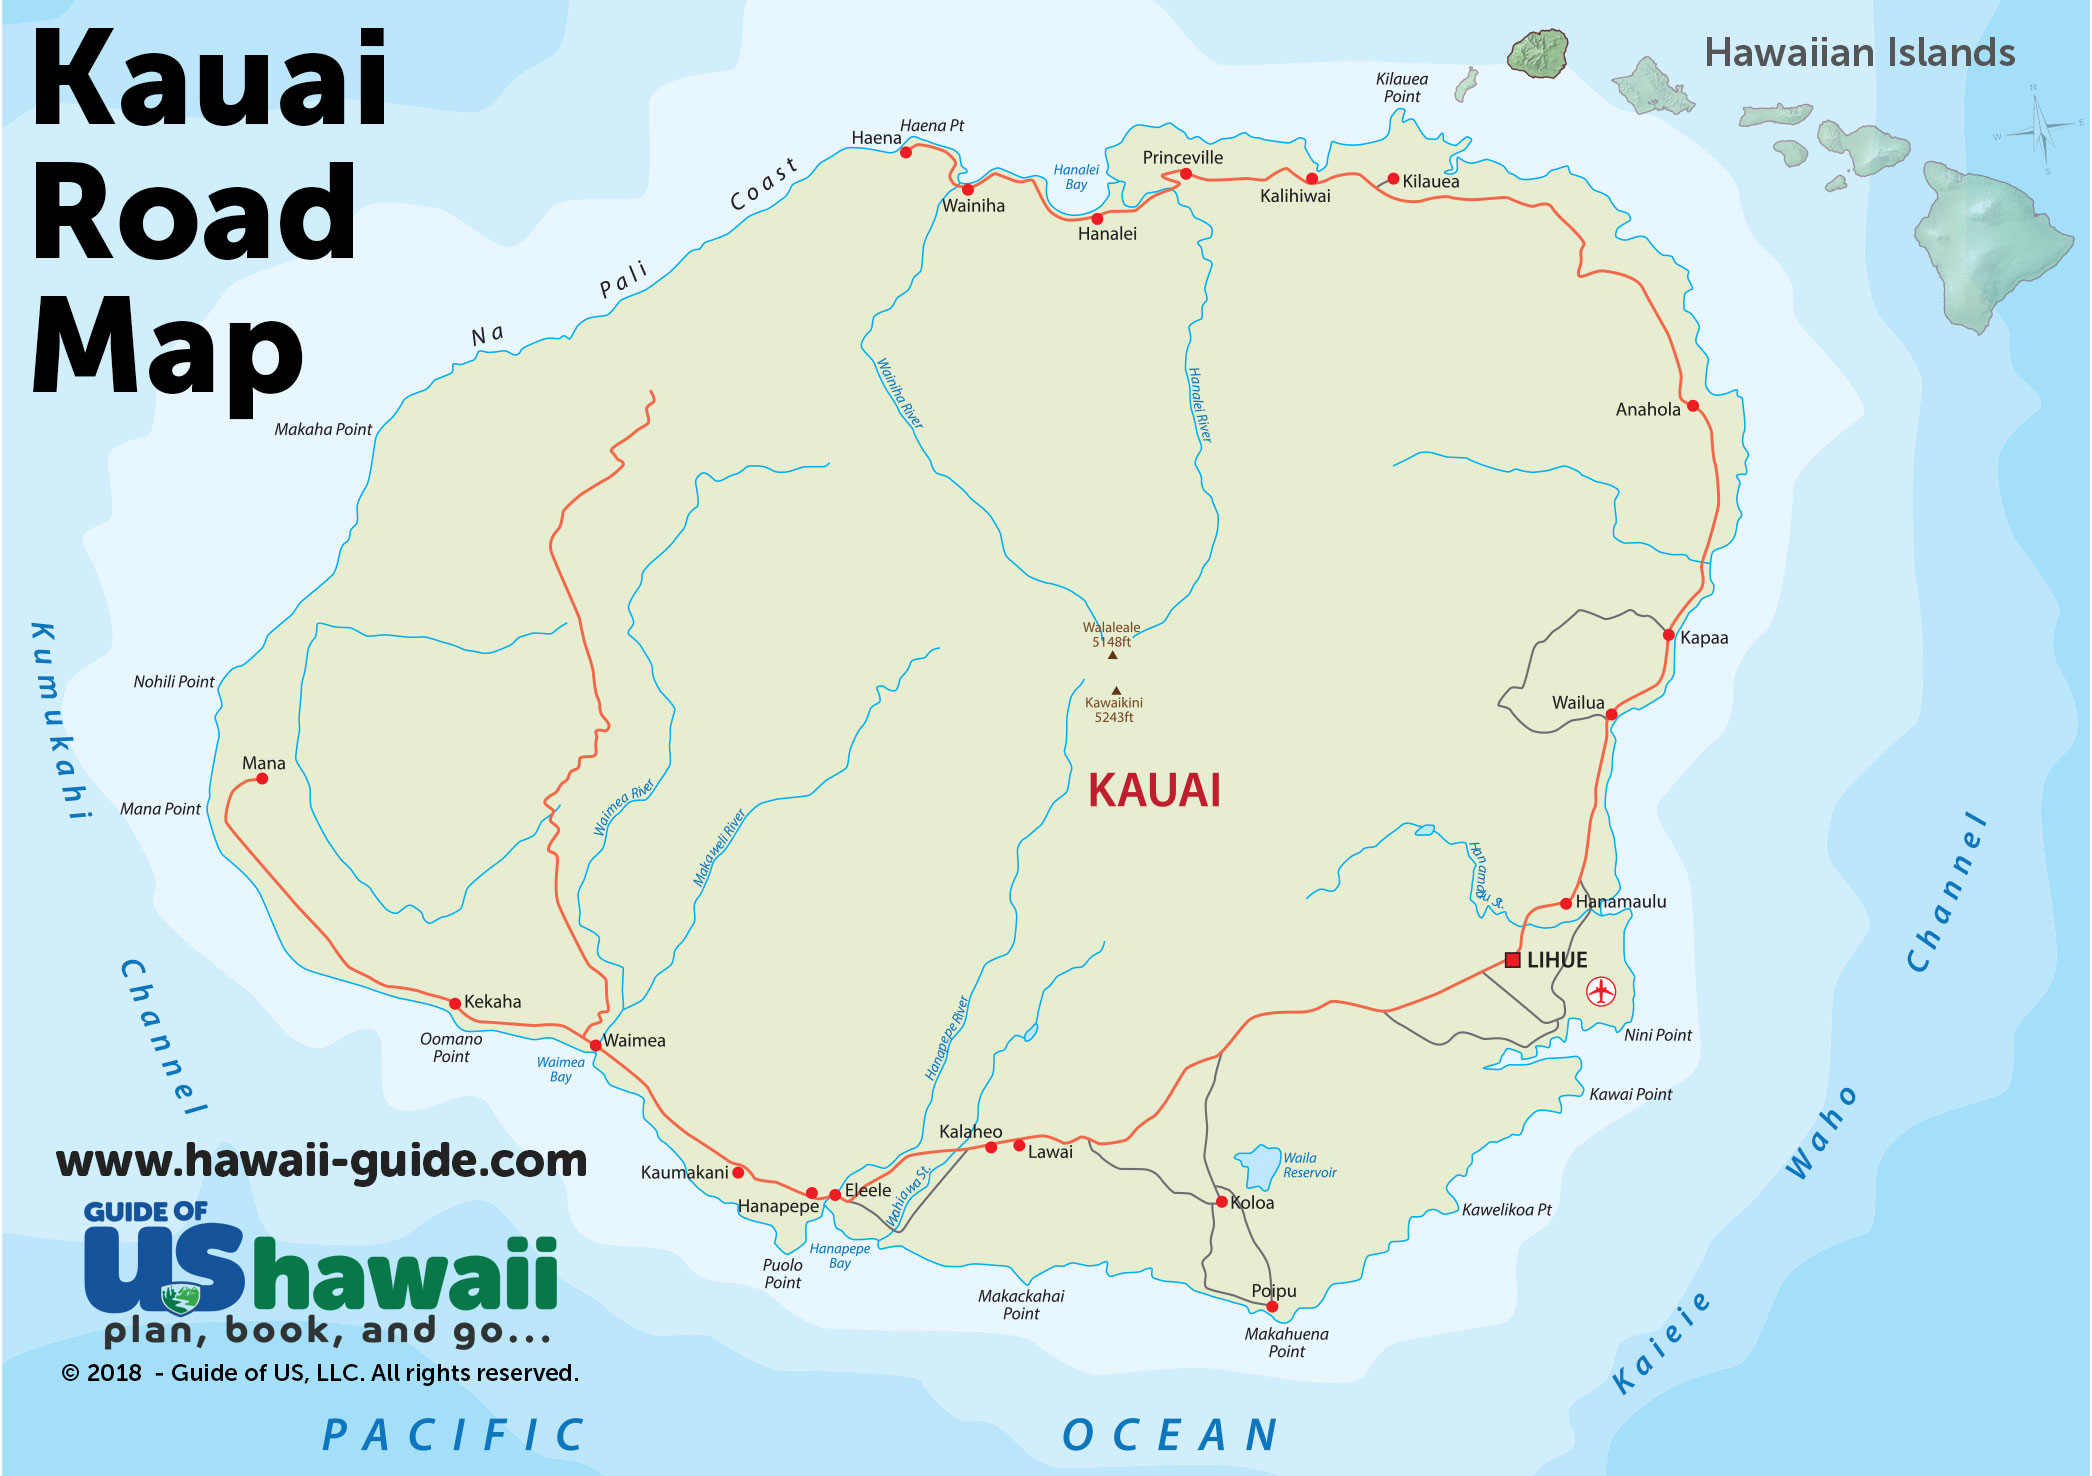 Kauai Maps on tourist map of iceland, tourist map of philadelphia pa, tourist map of vienna austria, tourist map of sri lanka, tourist map of geneva switzerland, tourist map of montego bay, tourist map of hollywood ca, tourist map of athens greece, tourist map of milan italy, tourist map of portofino italy, tourist map of oahu hawaii, tourist map of brussels belgium, tourist map of scotland uk, tourist map of st thomas, tourist map of istanbul turkey, tourist map of downtown seattle, tourist map of french quarter, tourist map of midtown manhattan, tourist map of florence italy, tourist map of monte carlo,